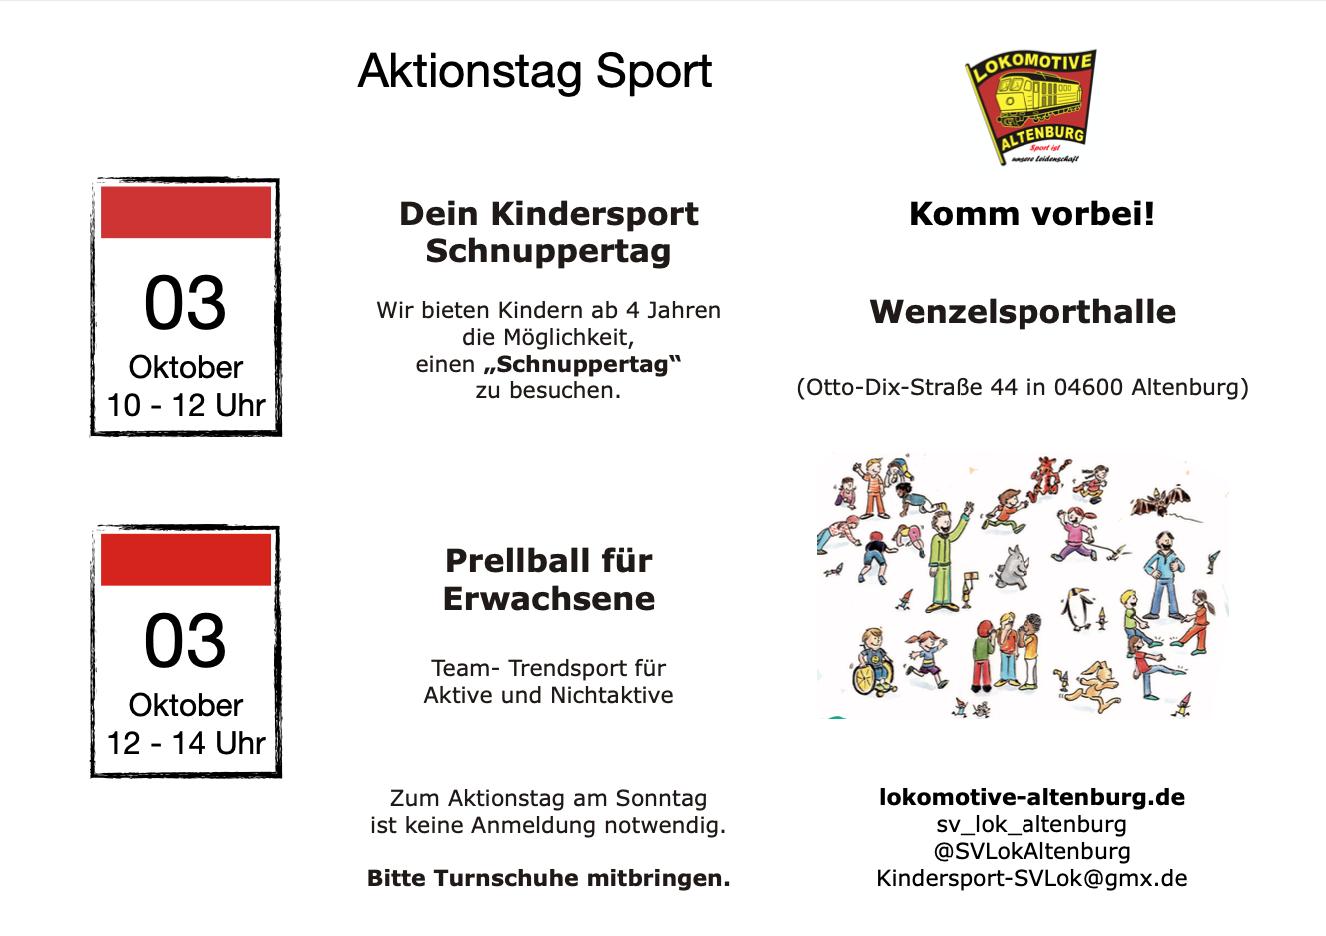 Aktionstag Sport